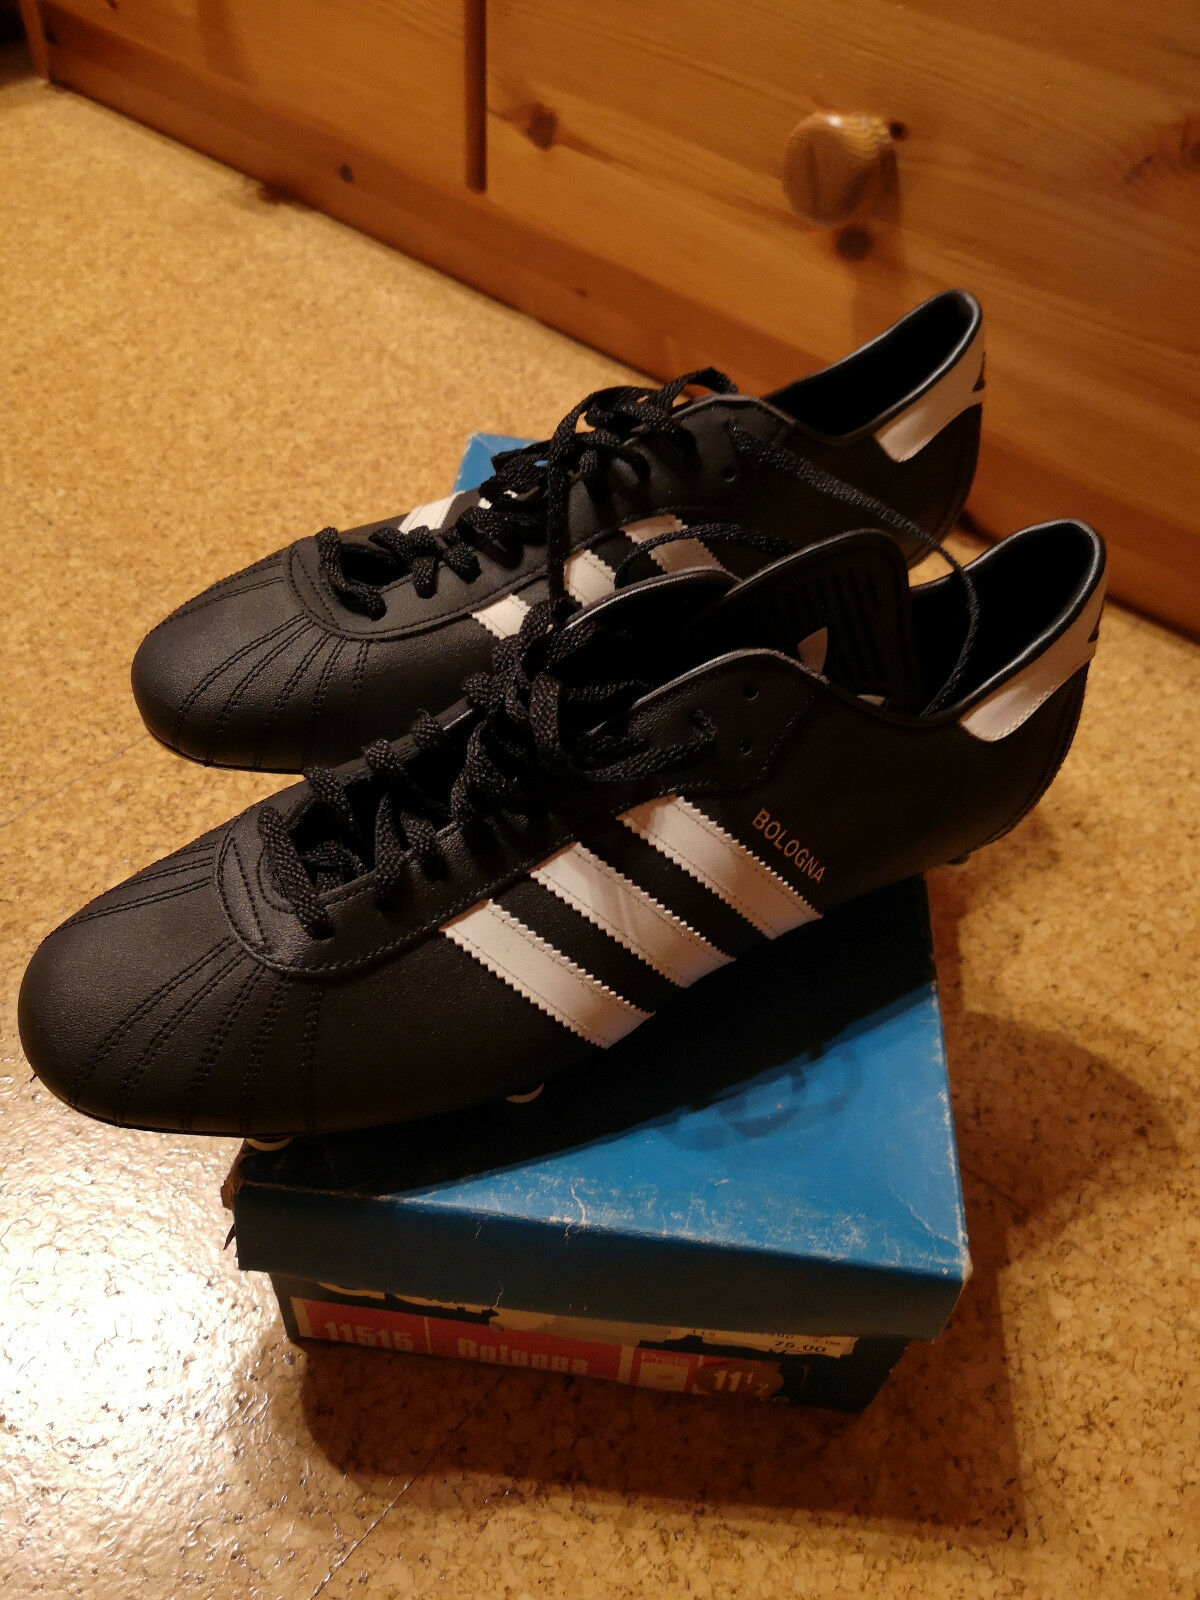 Adidas Fußballschuhe Bologna, Größe 46, Schraubstollen, Schraubstollen, Schraubstollen, Neu, Vintage 2833f8